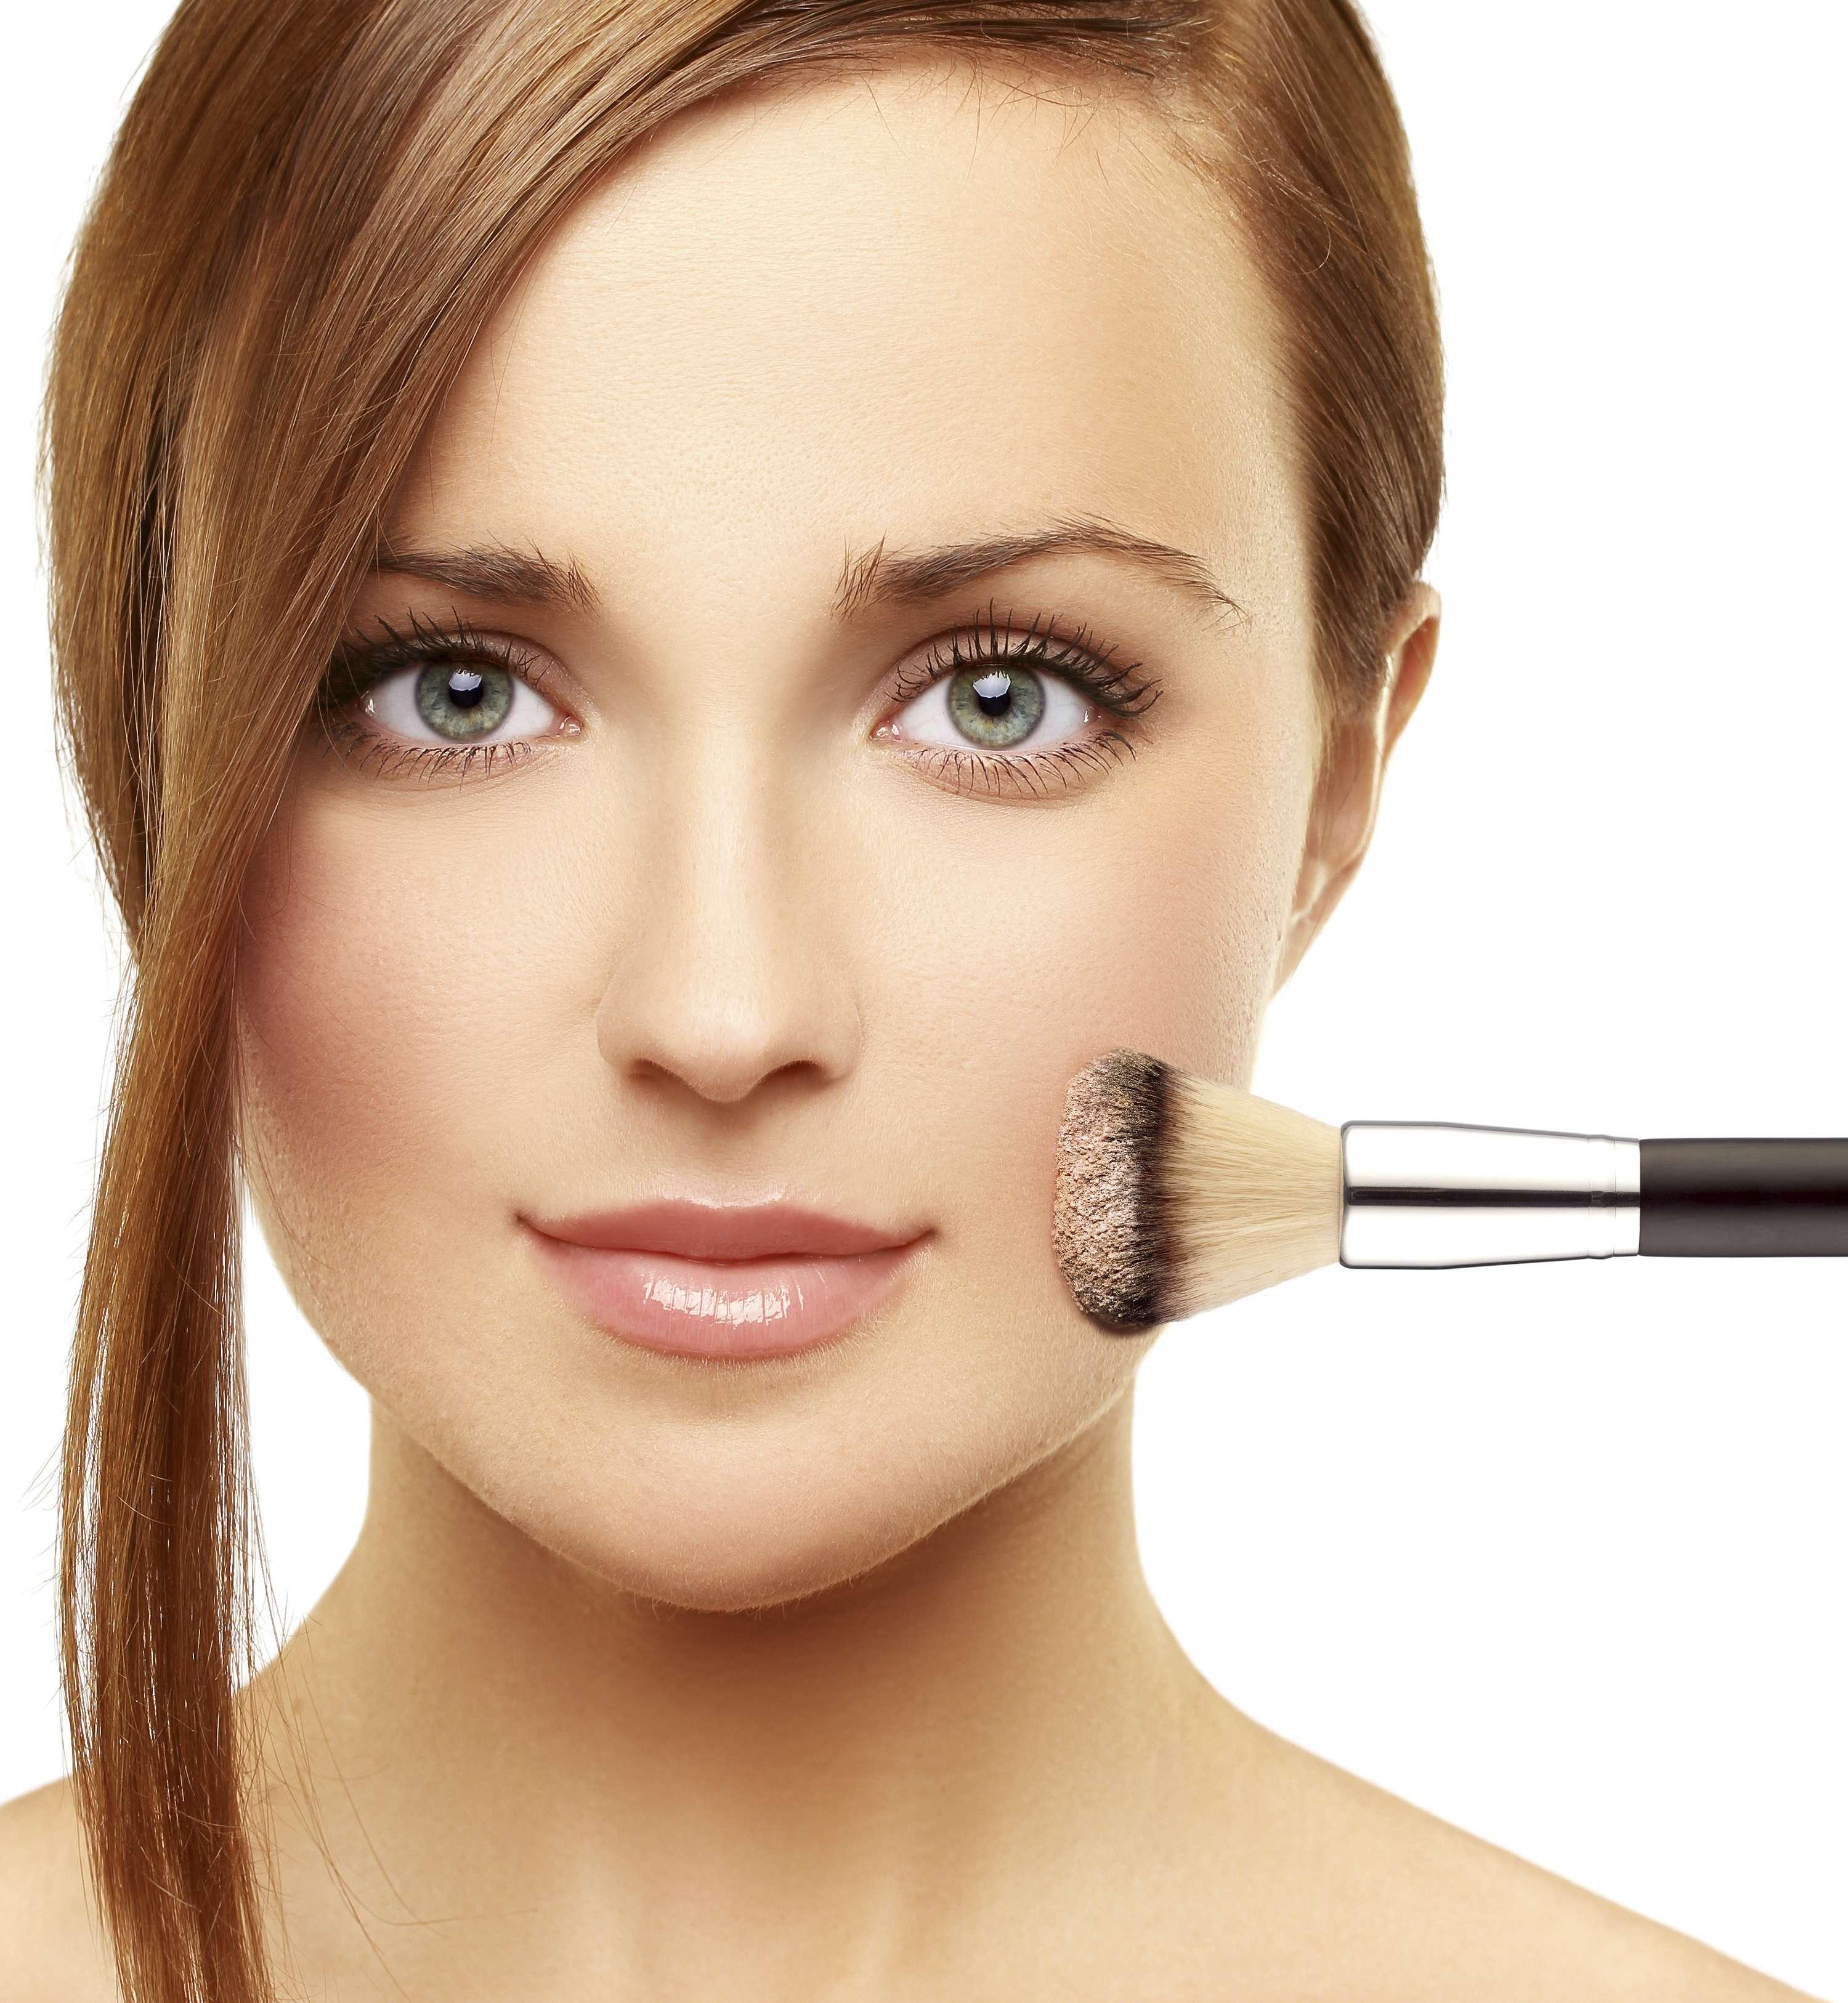 Maquillaje más popular. Foto: Thinkstock